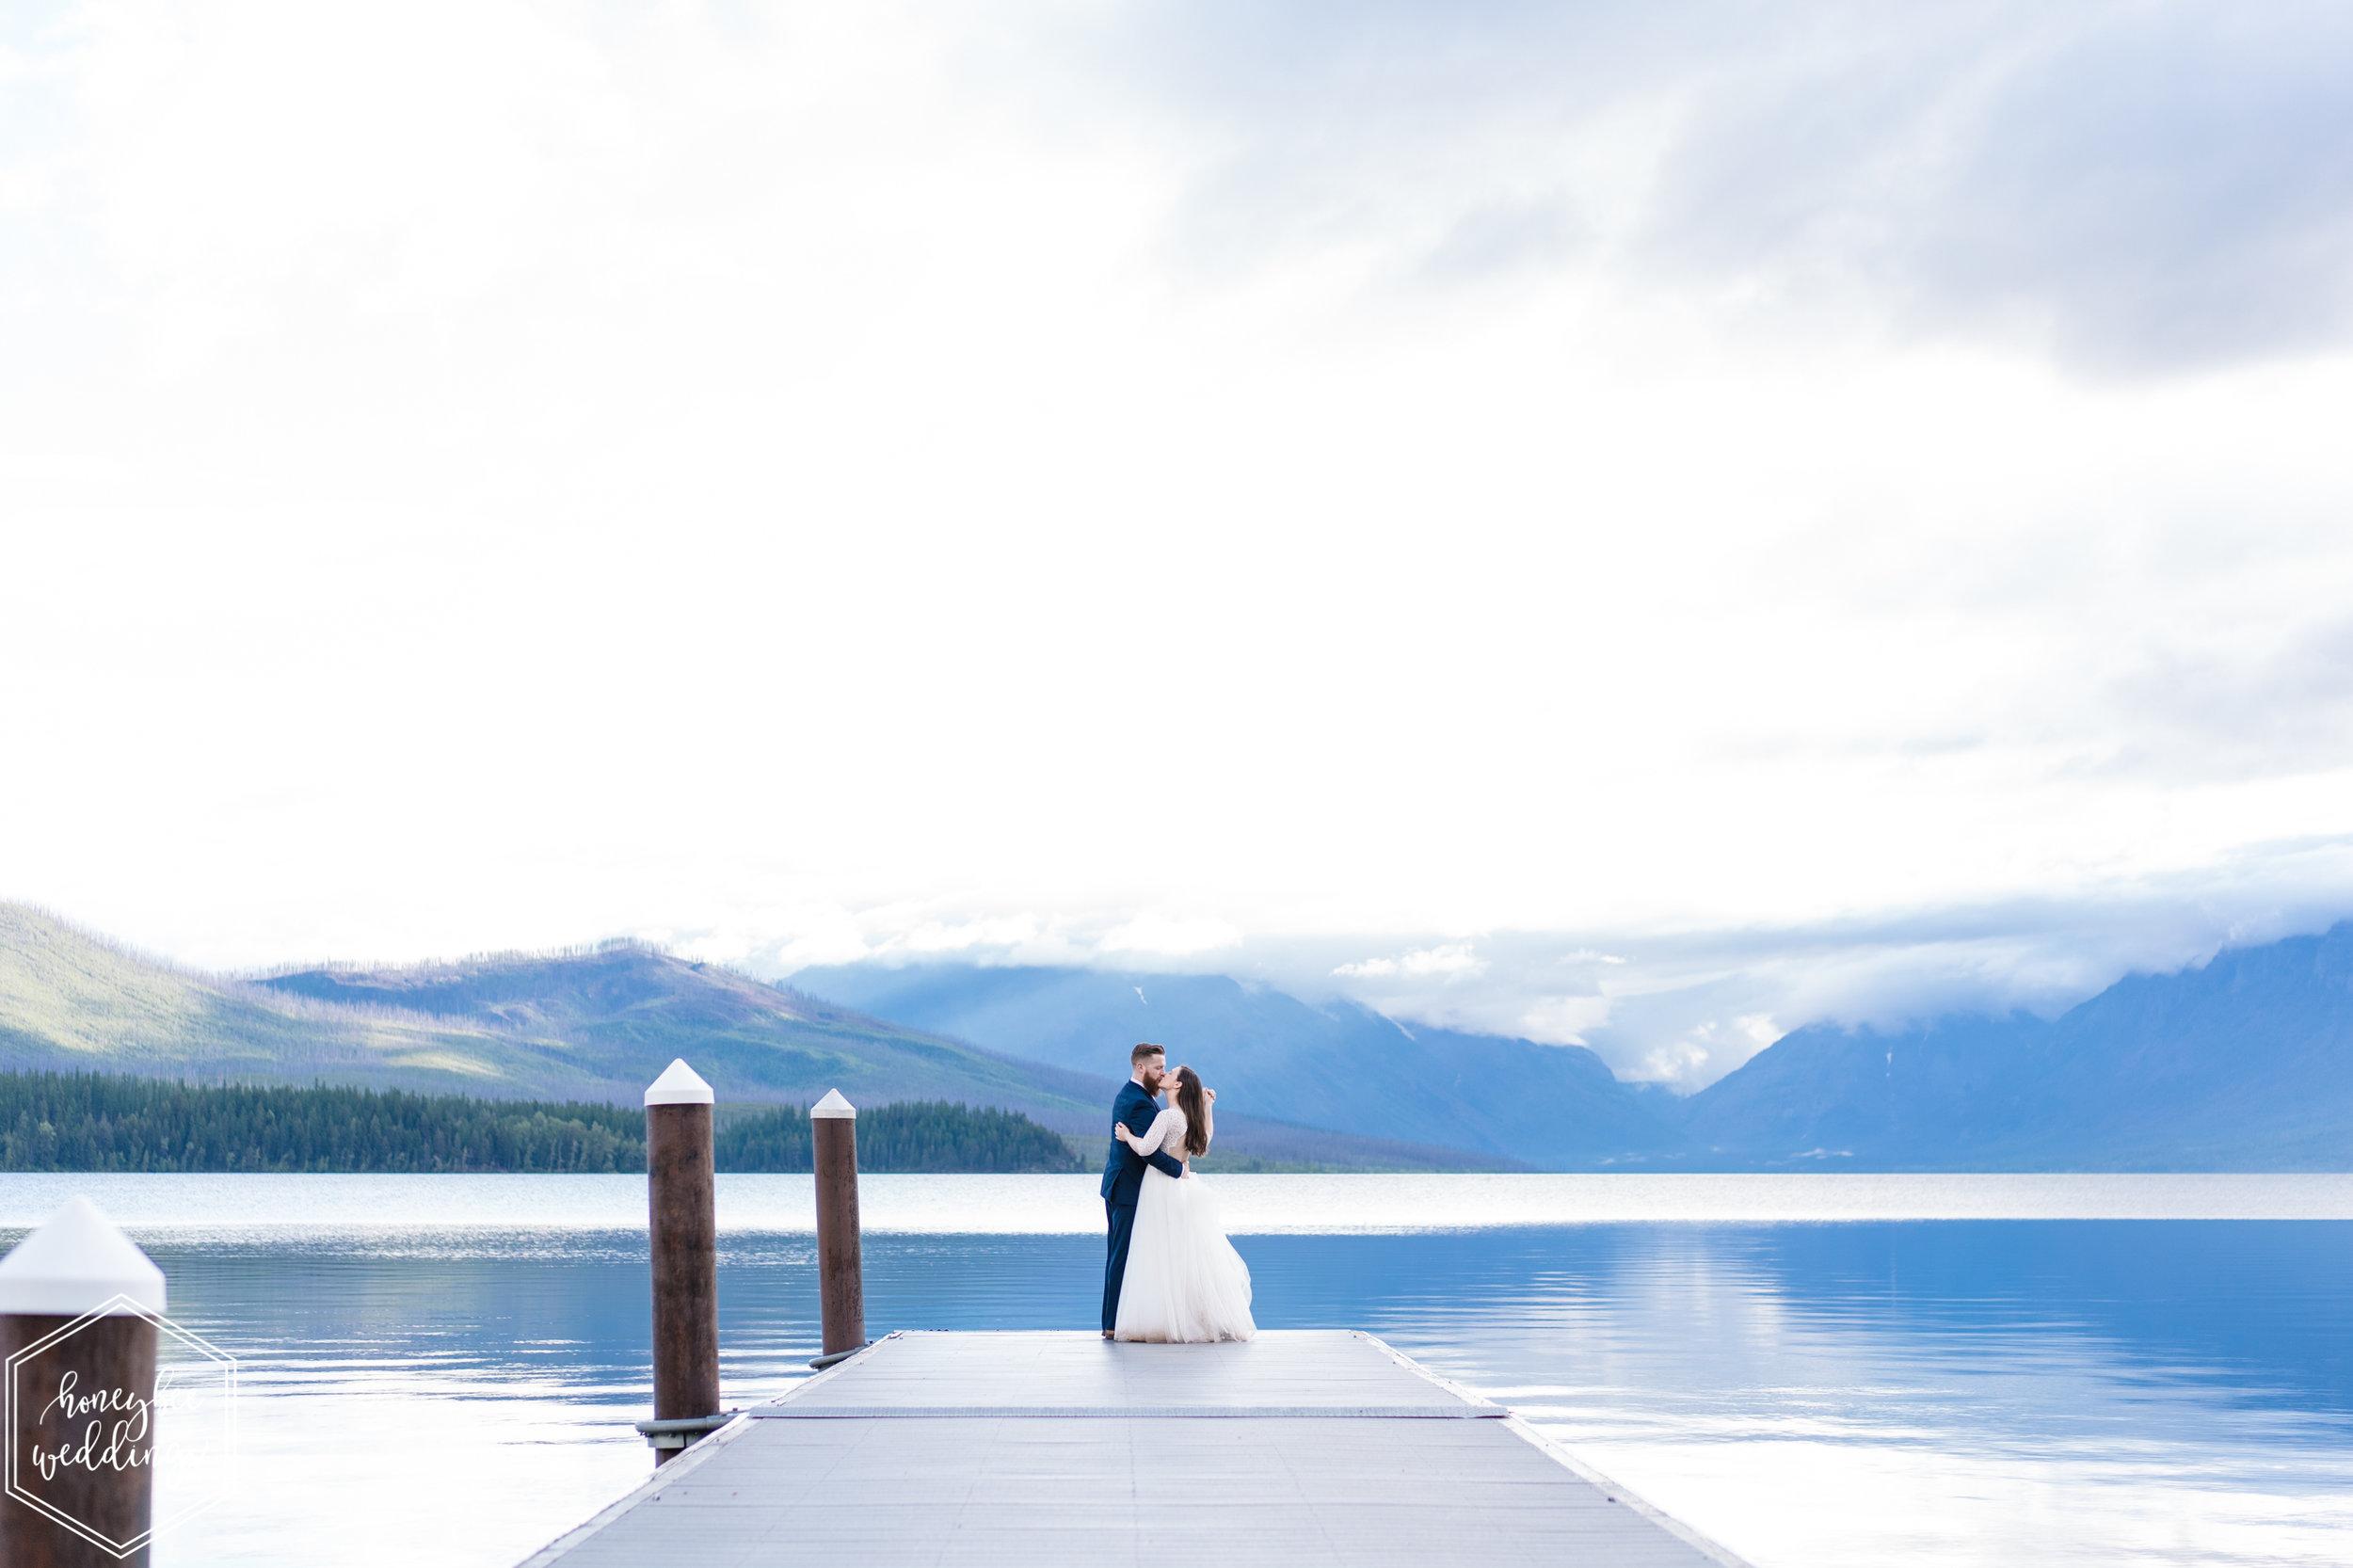 223Glacier National Park Wedding_Izaak Walton Inn Wedding_Honeybee Weddings_Norah & Kyle_June 09, 2019-39.jpg